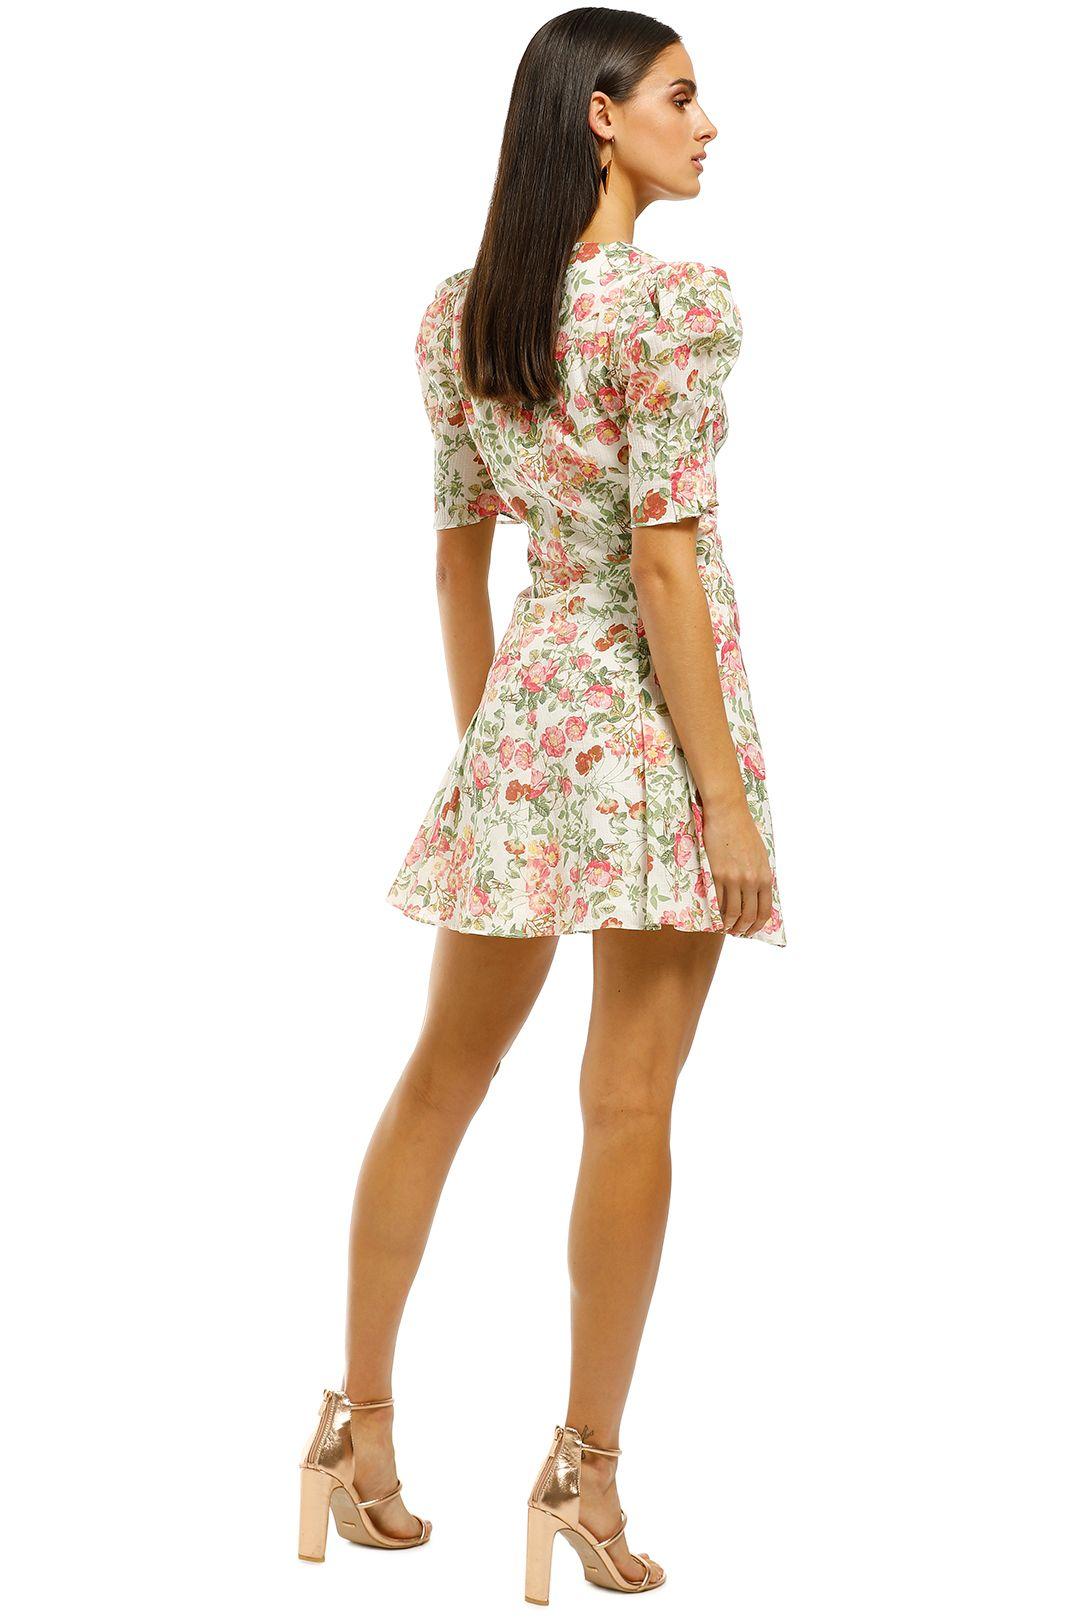 Bec+Bridge-Le-Follies-Mini-Dress-Back